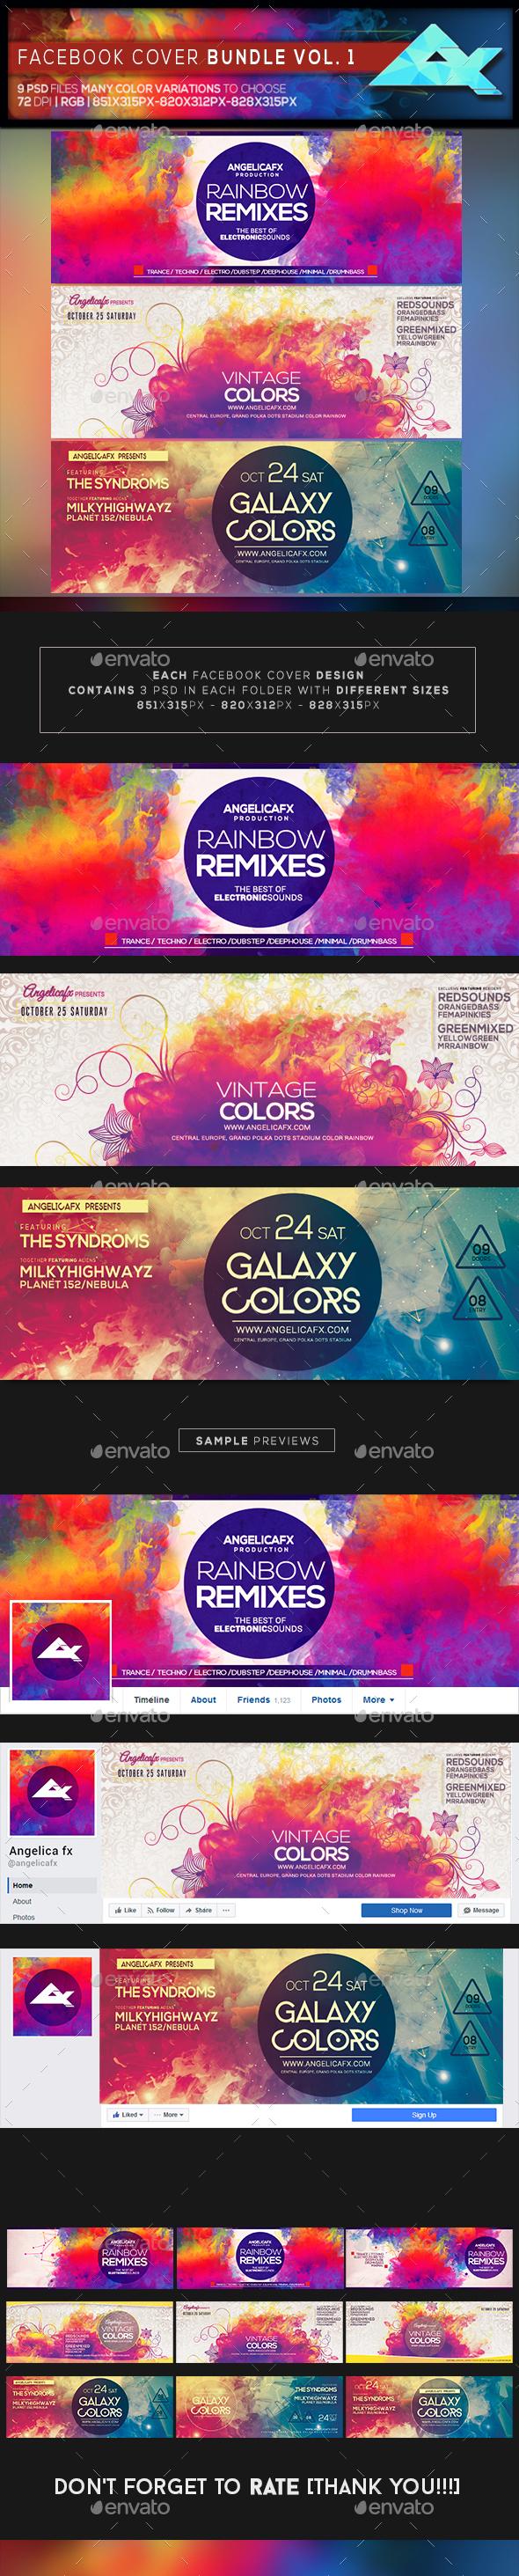 Colorful Facebook Cover Bundle Vol 1 - Facebook Timeline Covers Social Media